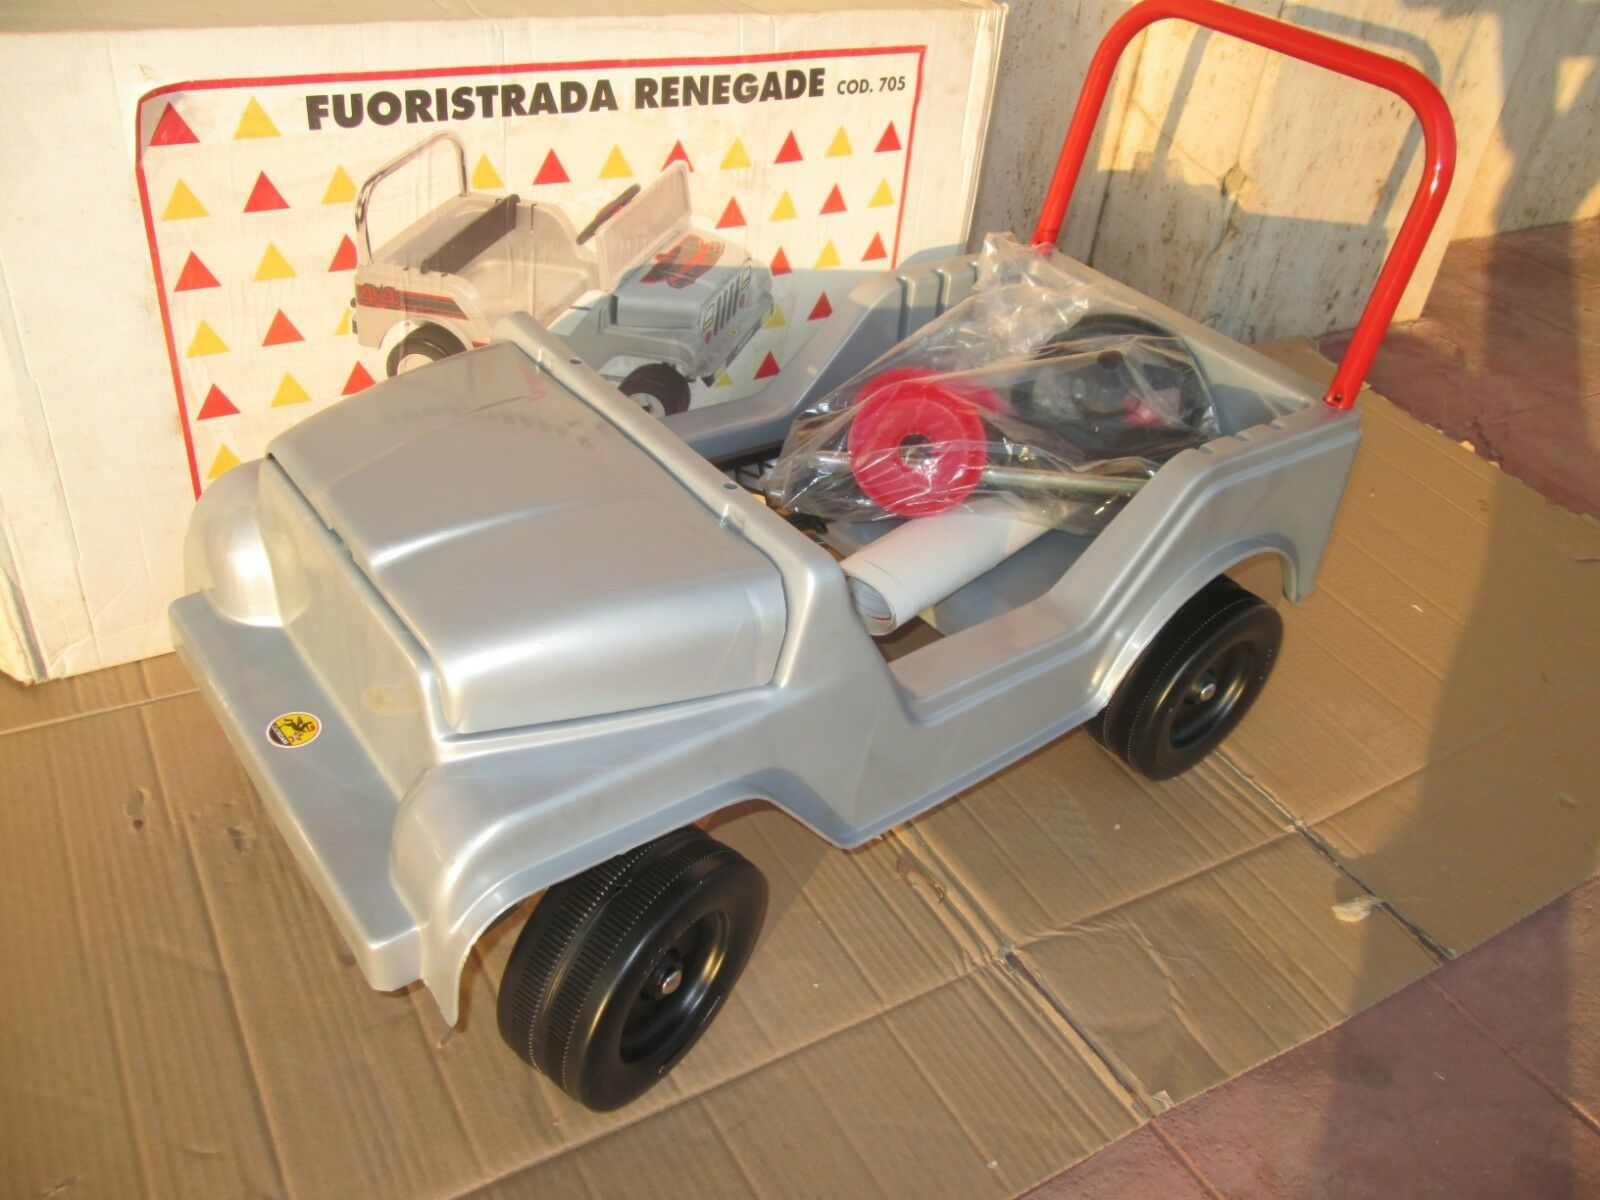 AGOSTINI TOYS FUORISTRA JEEP RENEGADE CJ7 CJ5 A PEDALI pedal car vintage anni 80